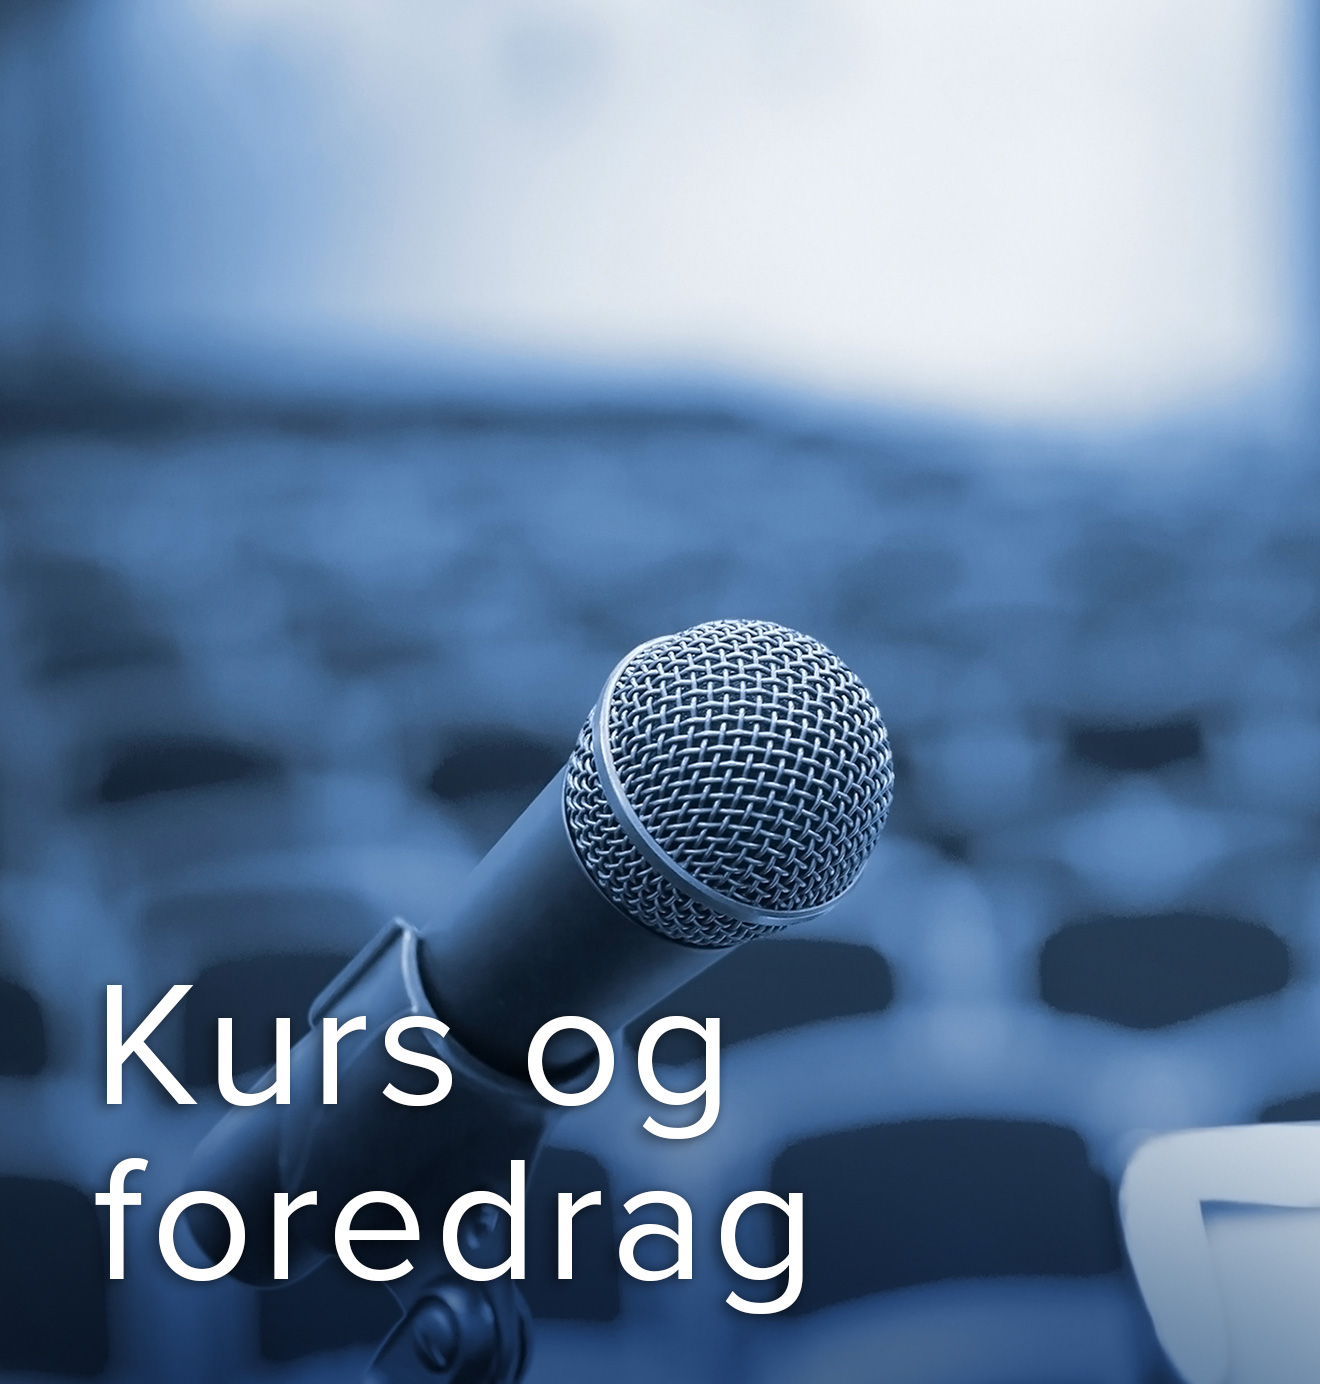 Foredrag-mic.jpg